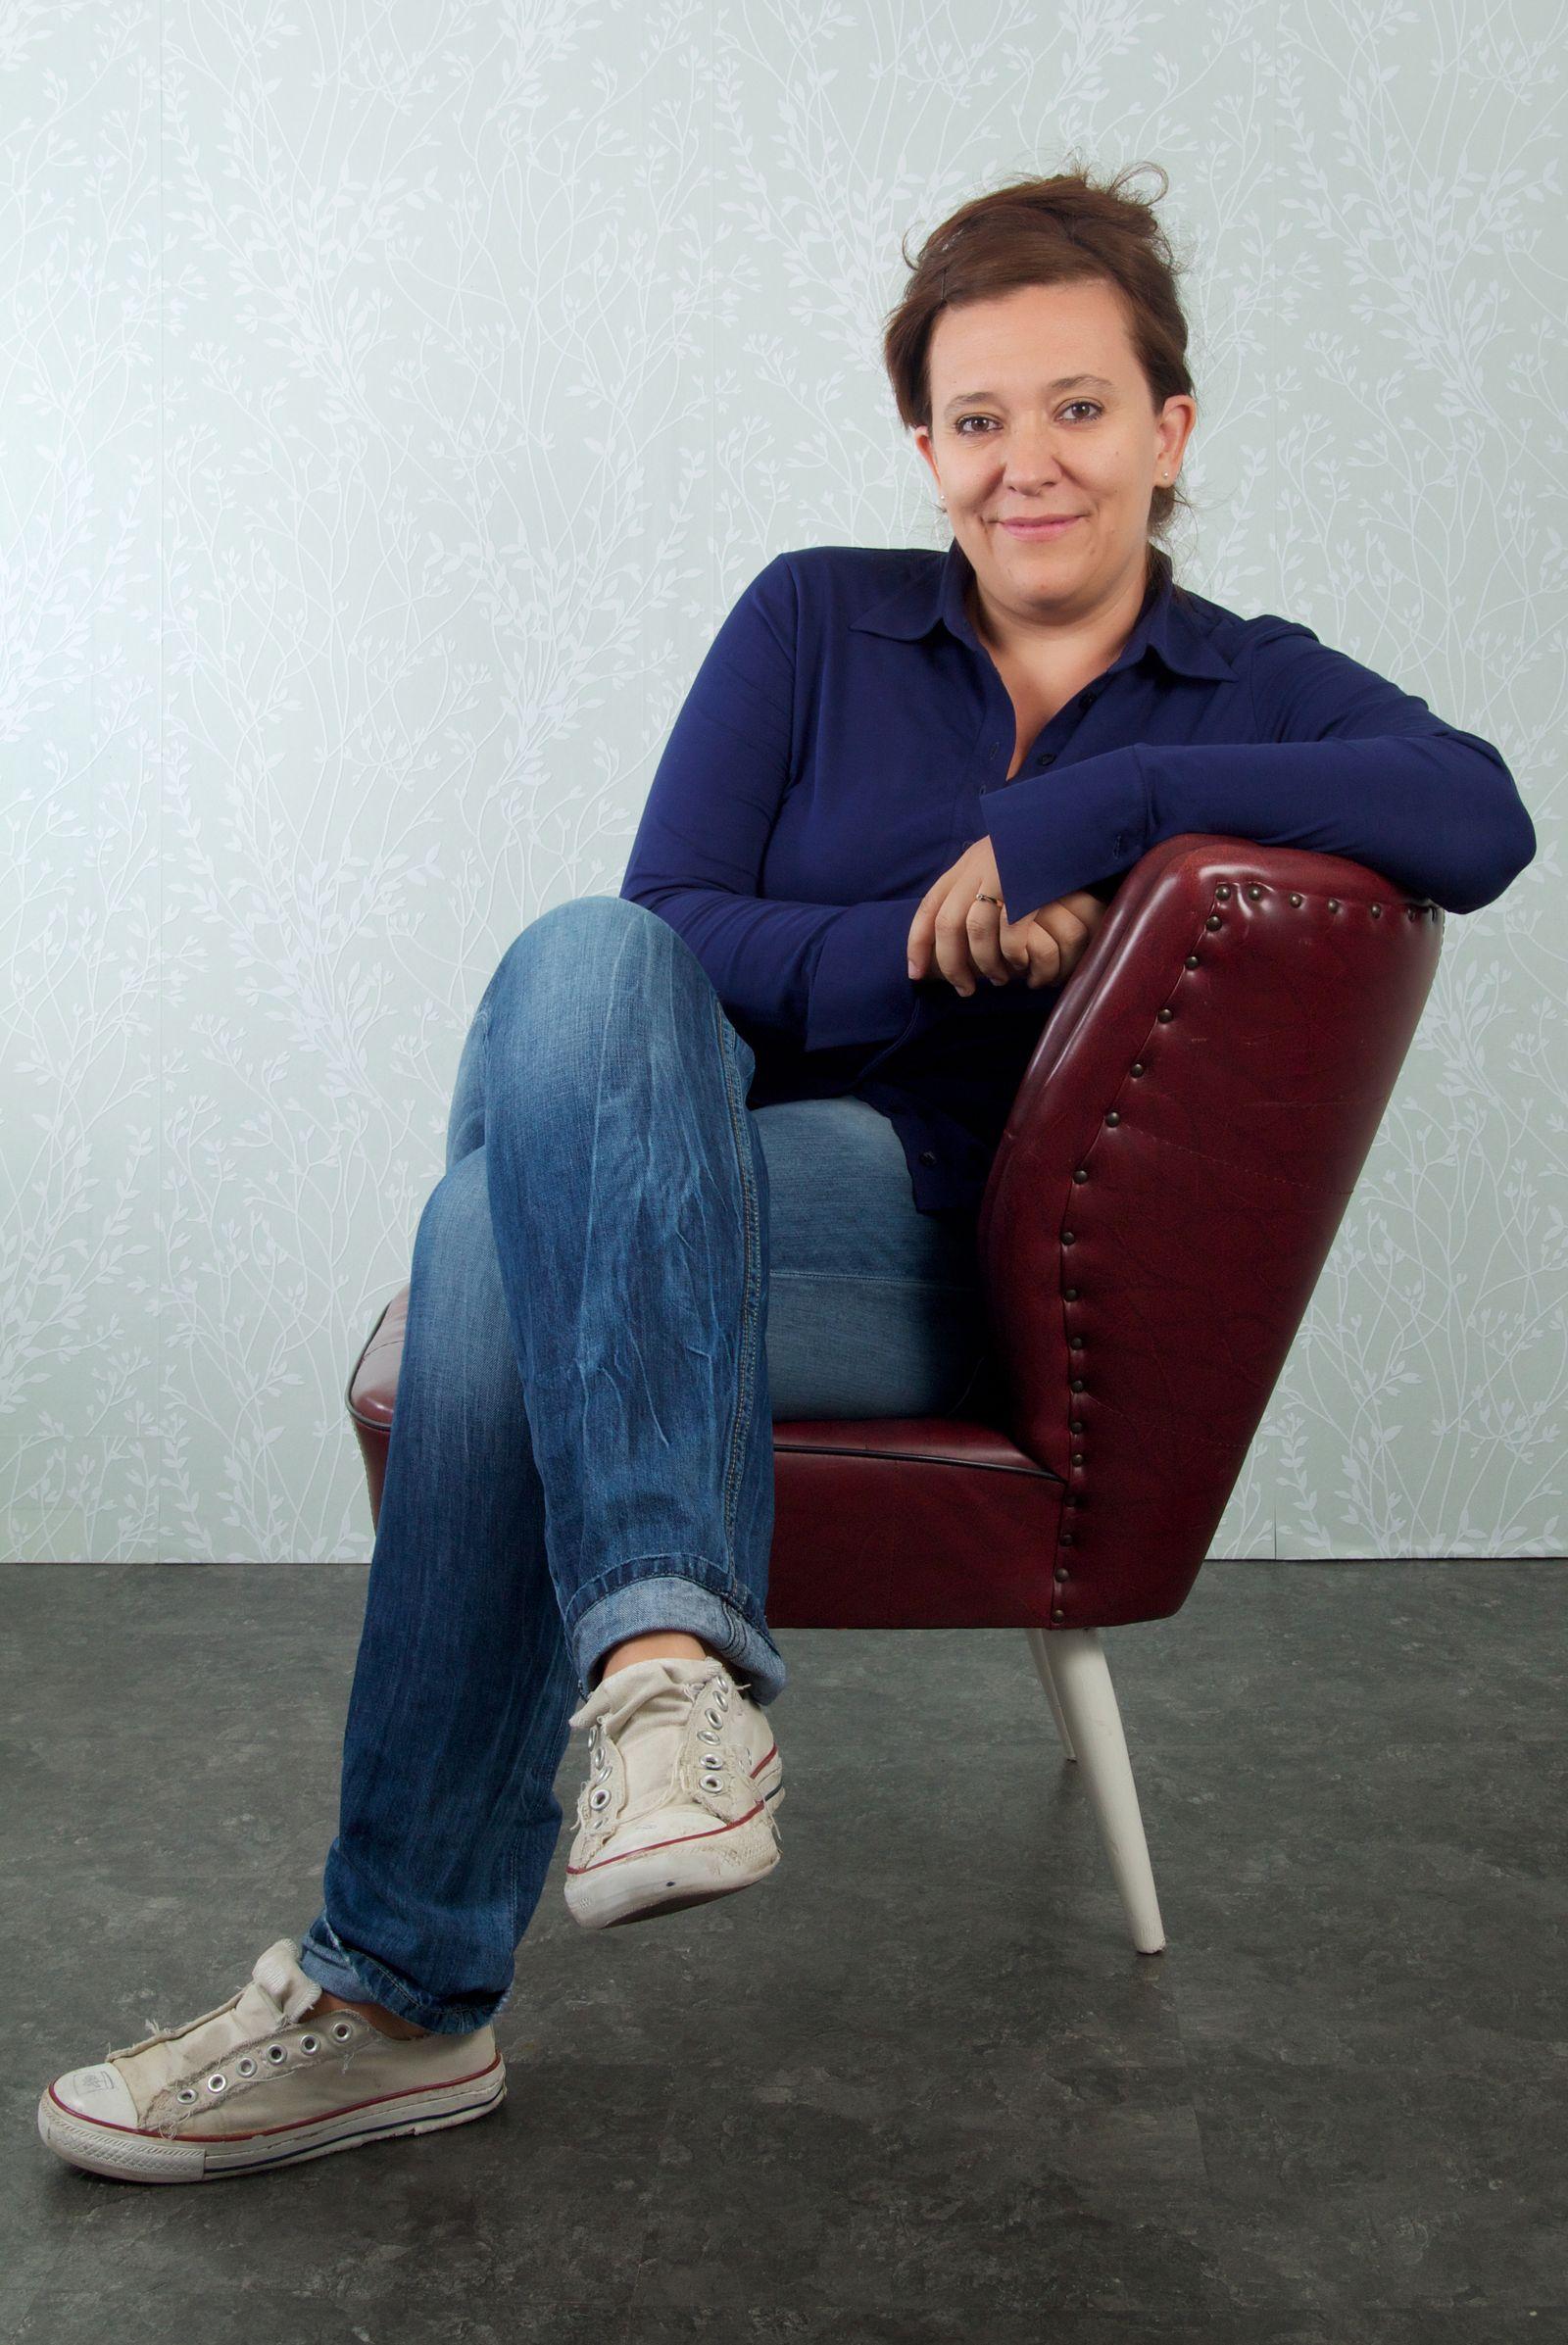 Caroline Seifert